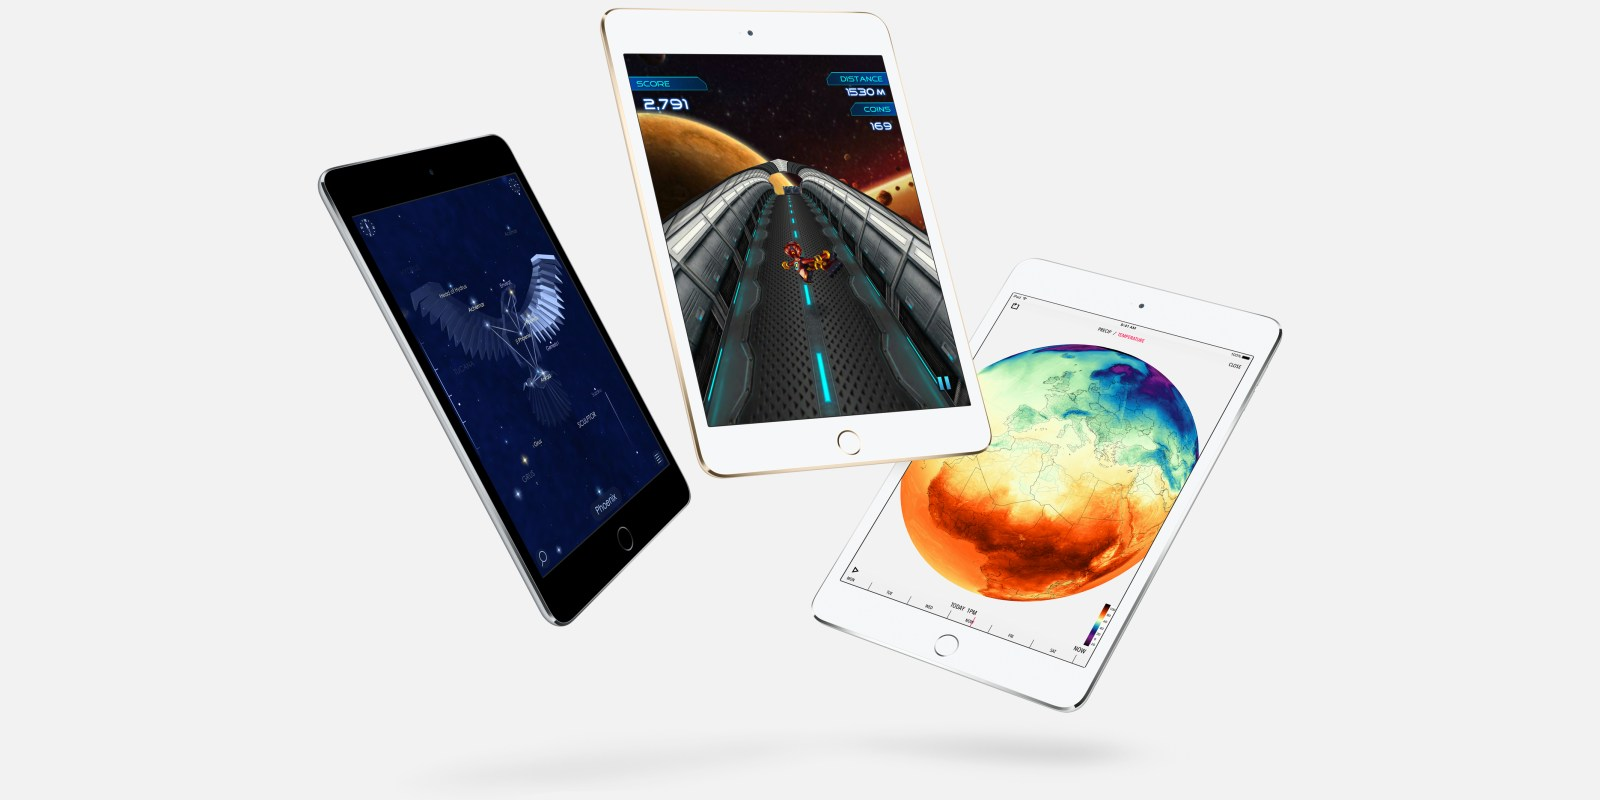 Apple iPad mini 4 Wi-Fi 64GB in all colors: $460 shipped (Reg. $499)